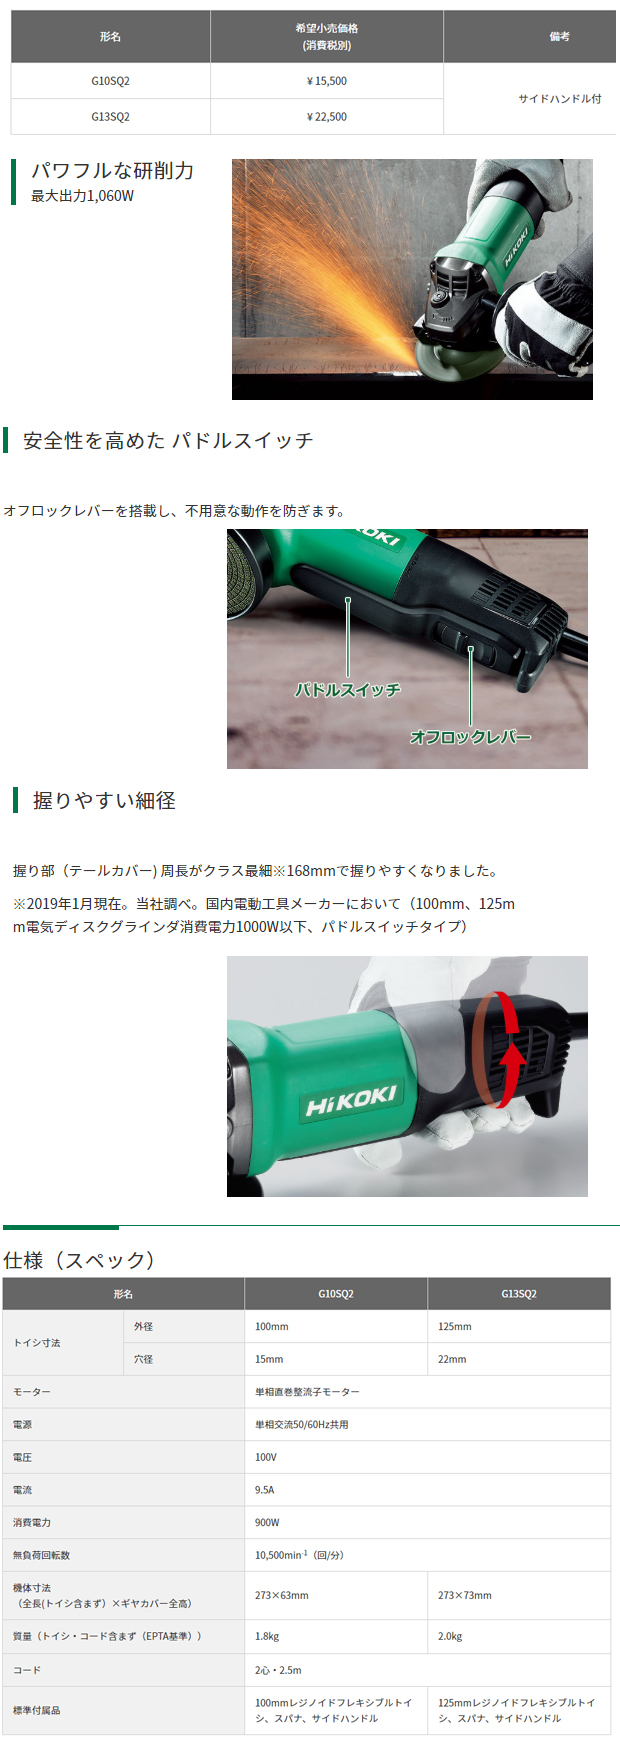 HiKOKI 100mm電気ディスクグラインダ G10SQ2